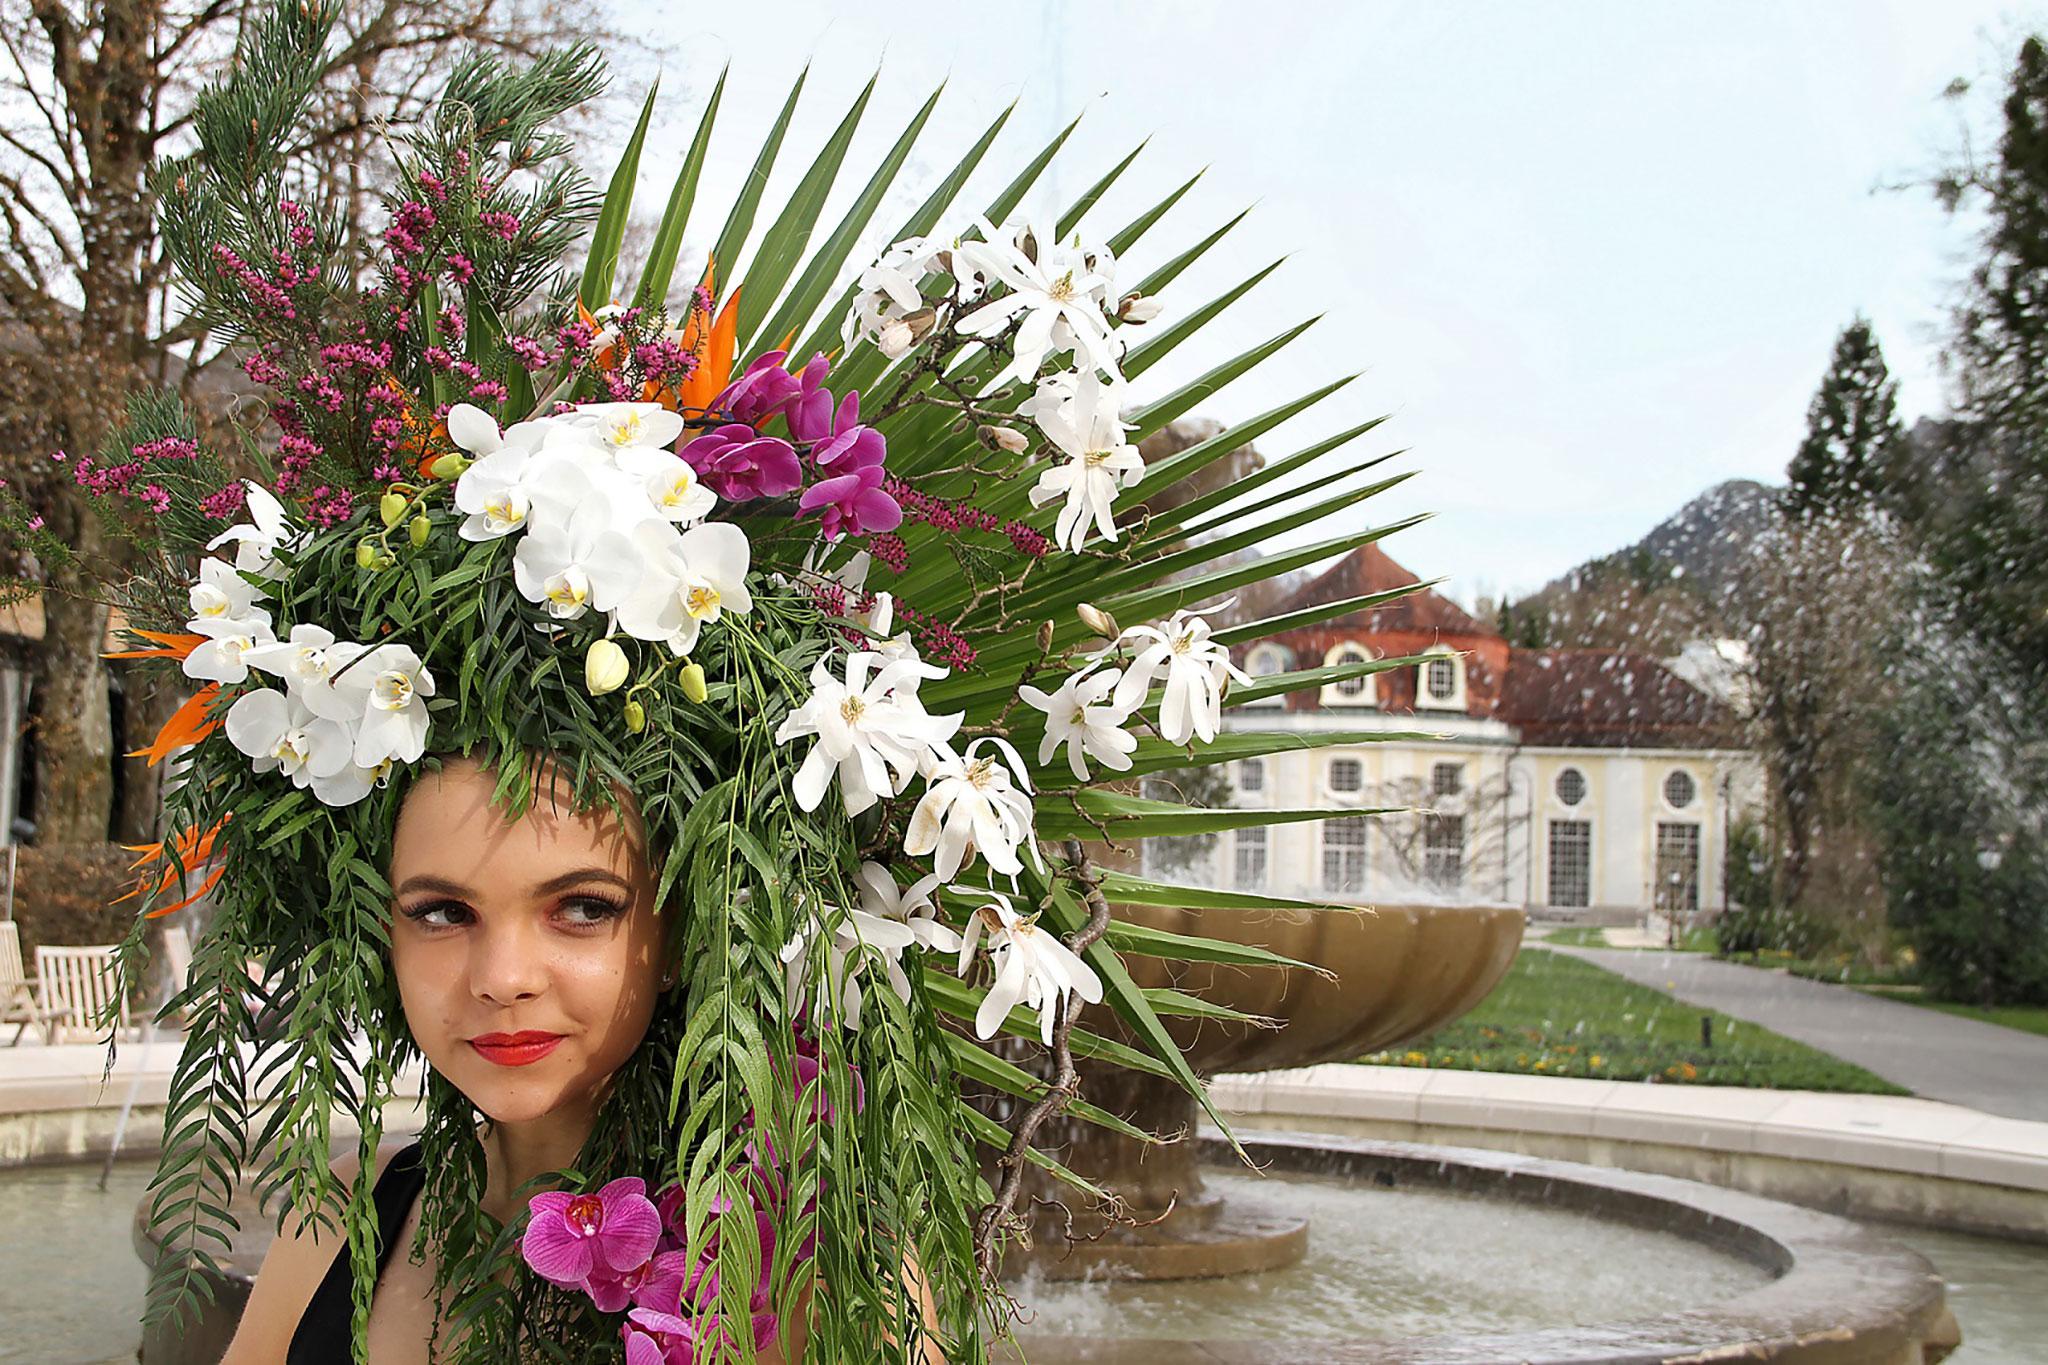 Konzertrotunde Archive - Berchtesgadener Land Blog